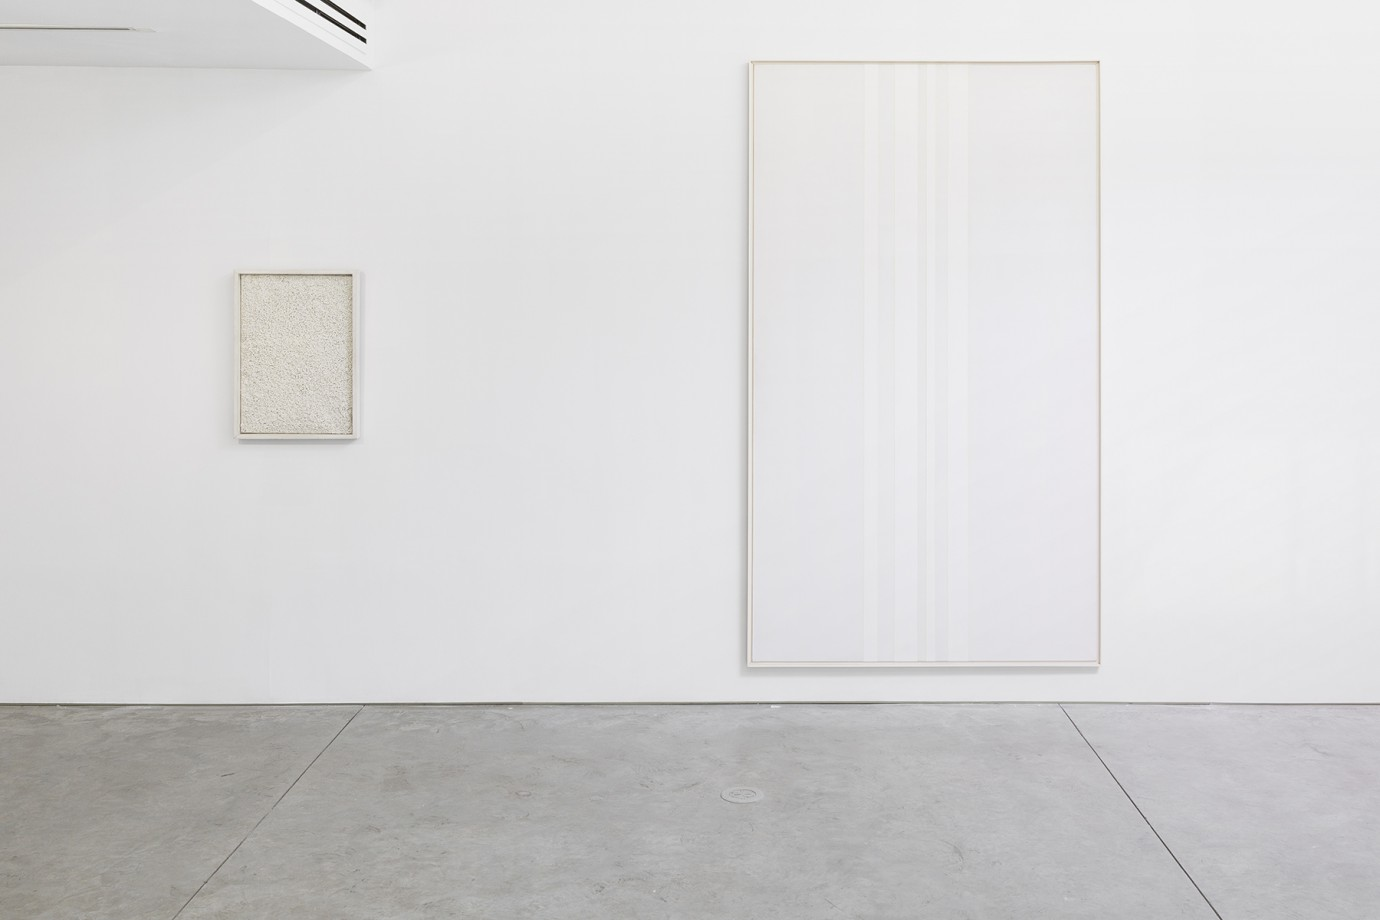 UNTITLED (MONOCHROME), 1957-2017